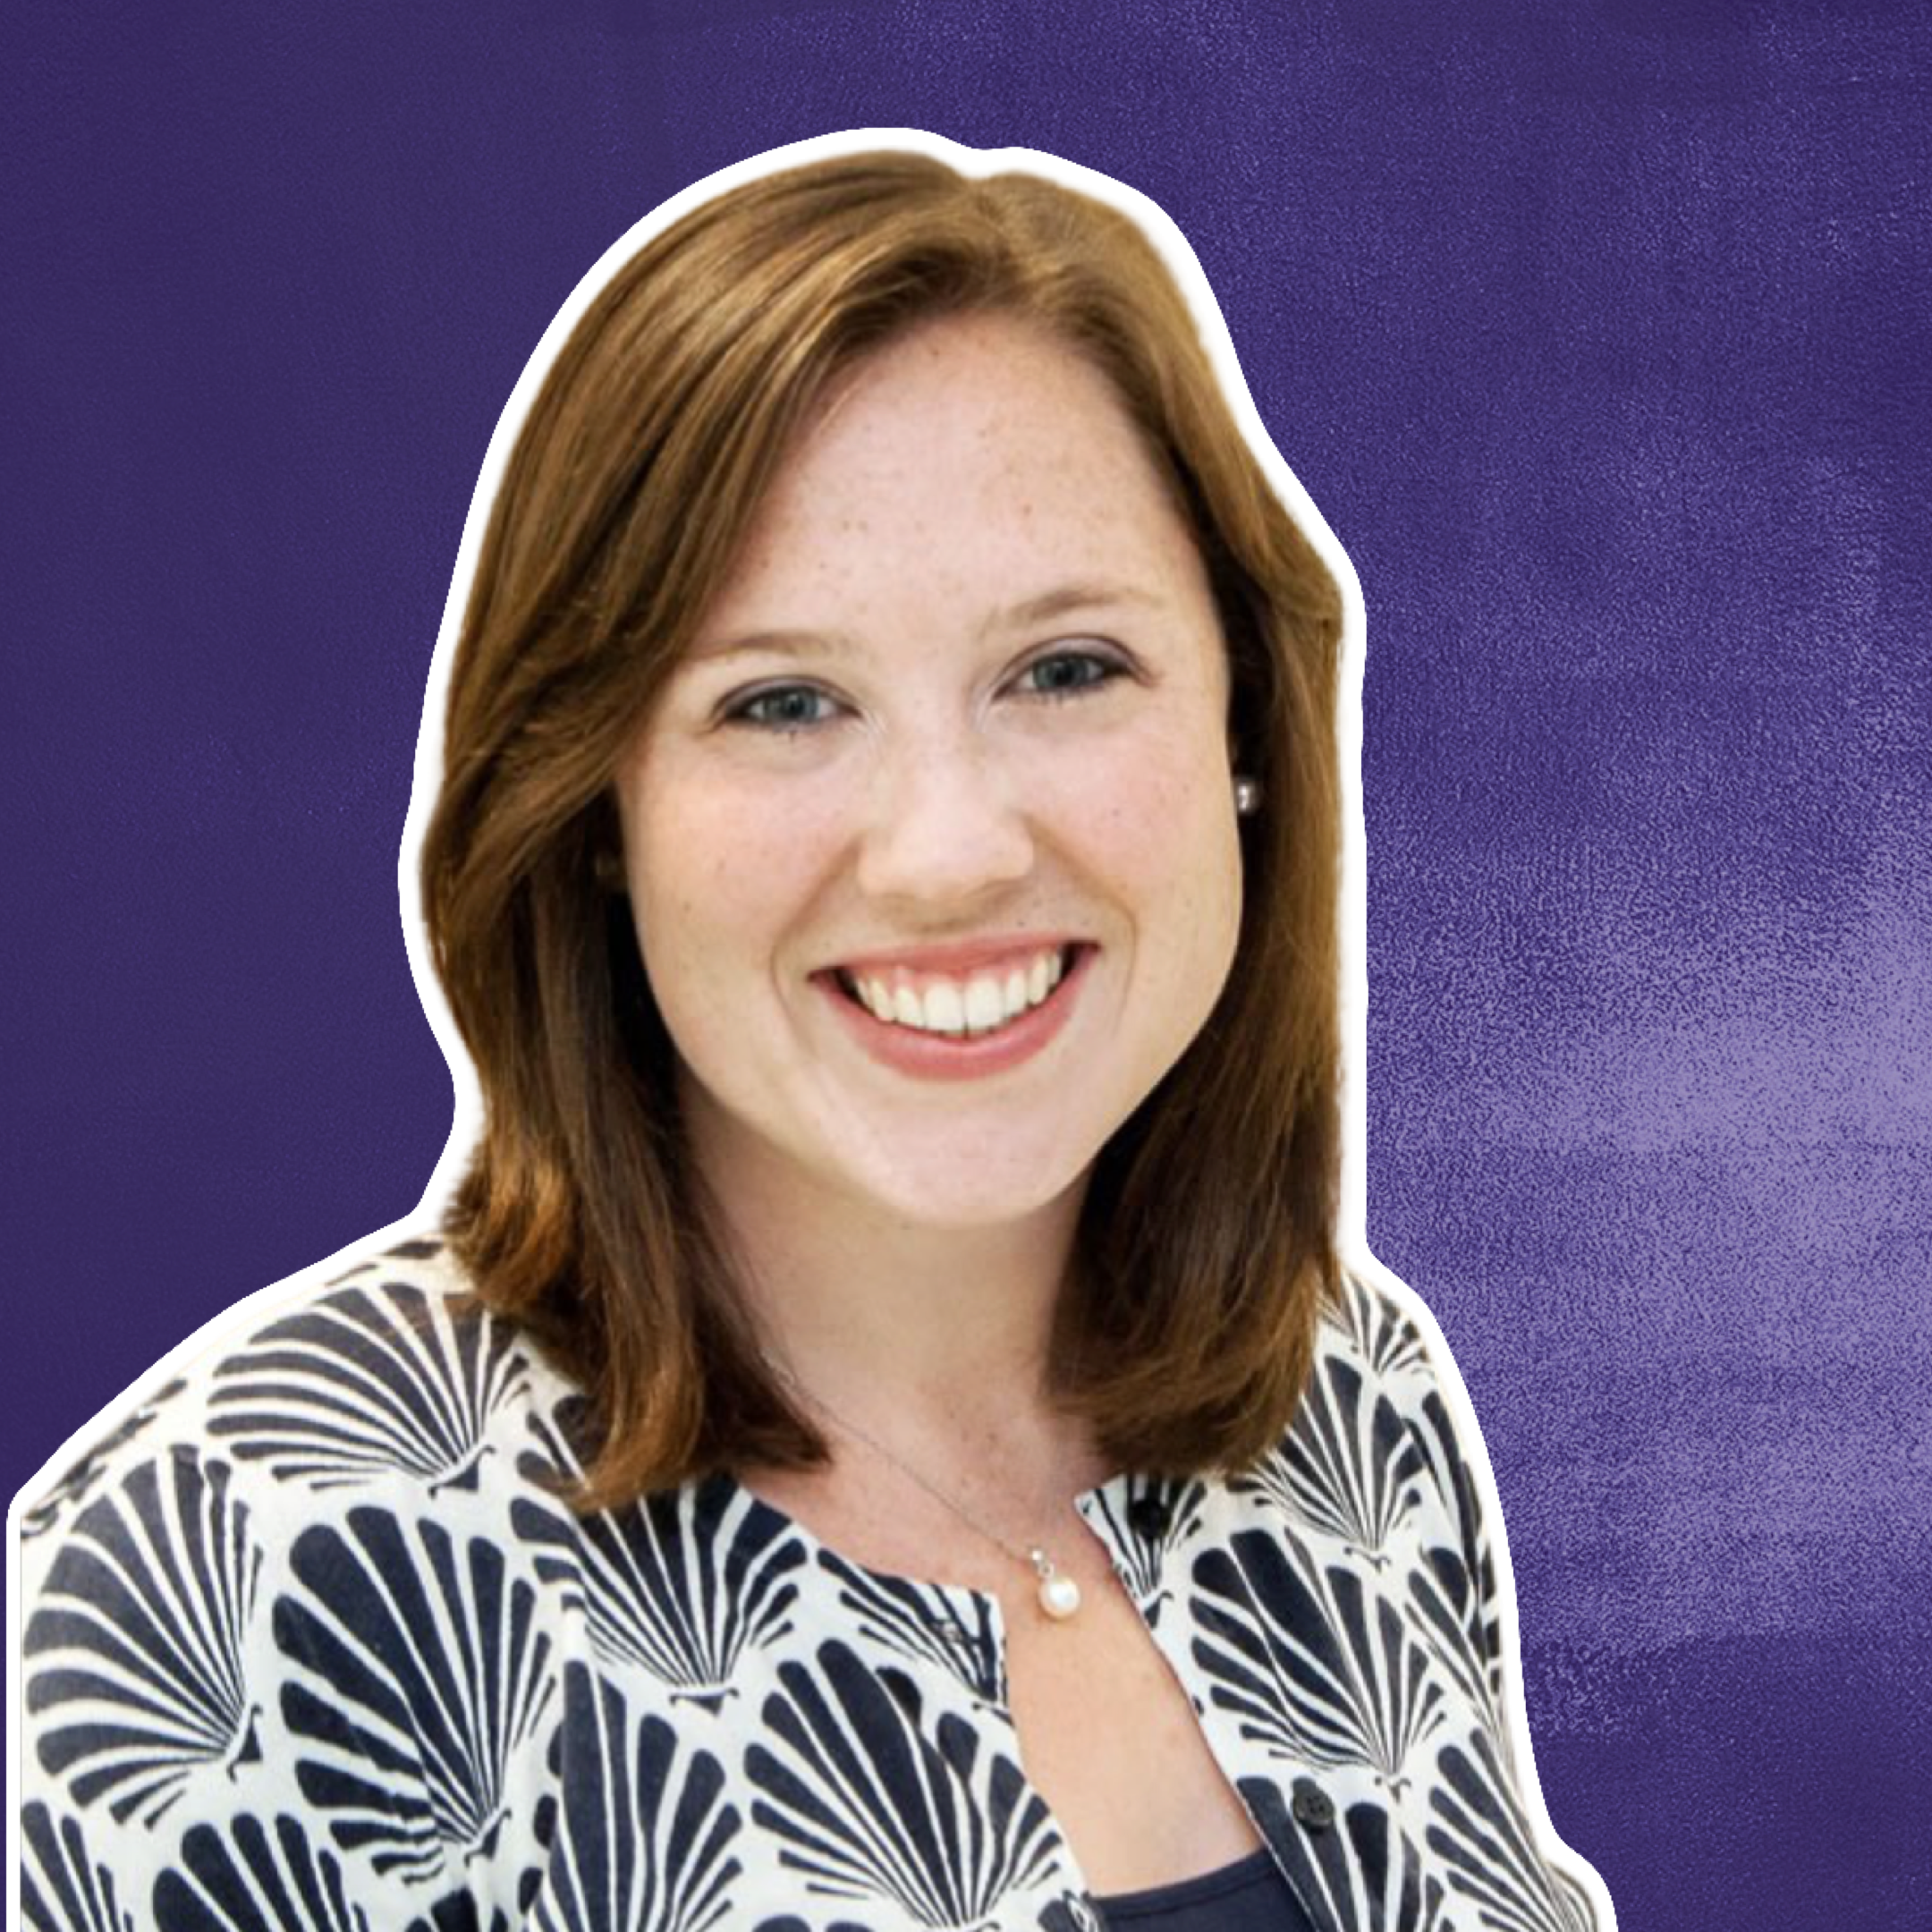 Hannah Debelius 1x1 Purple